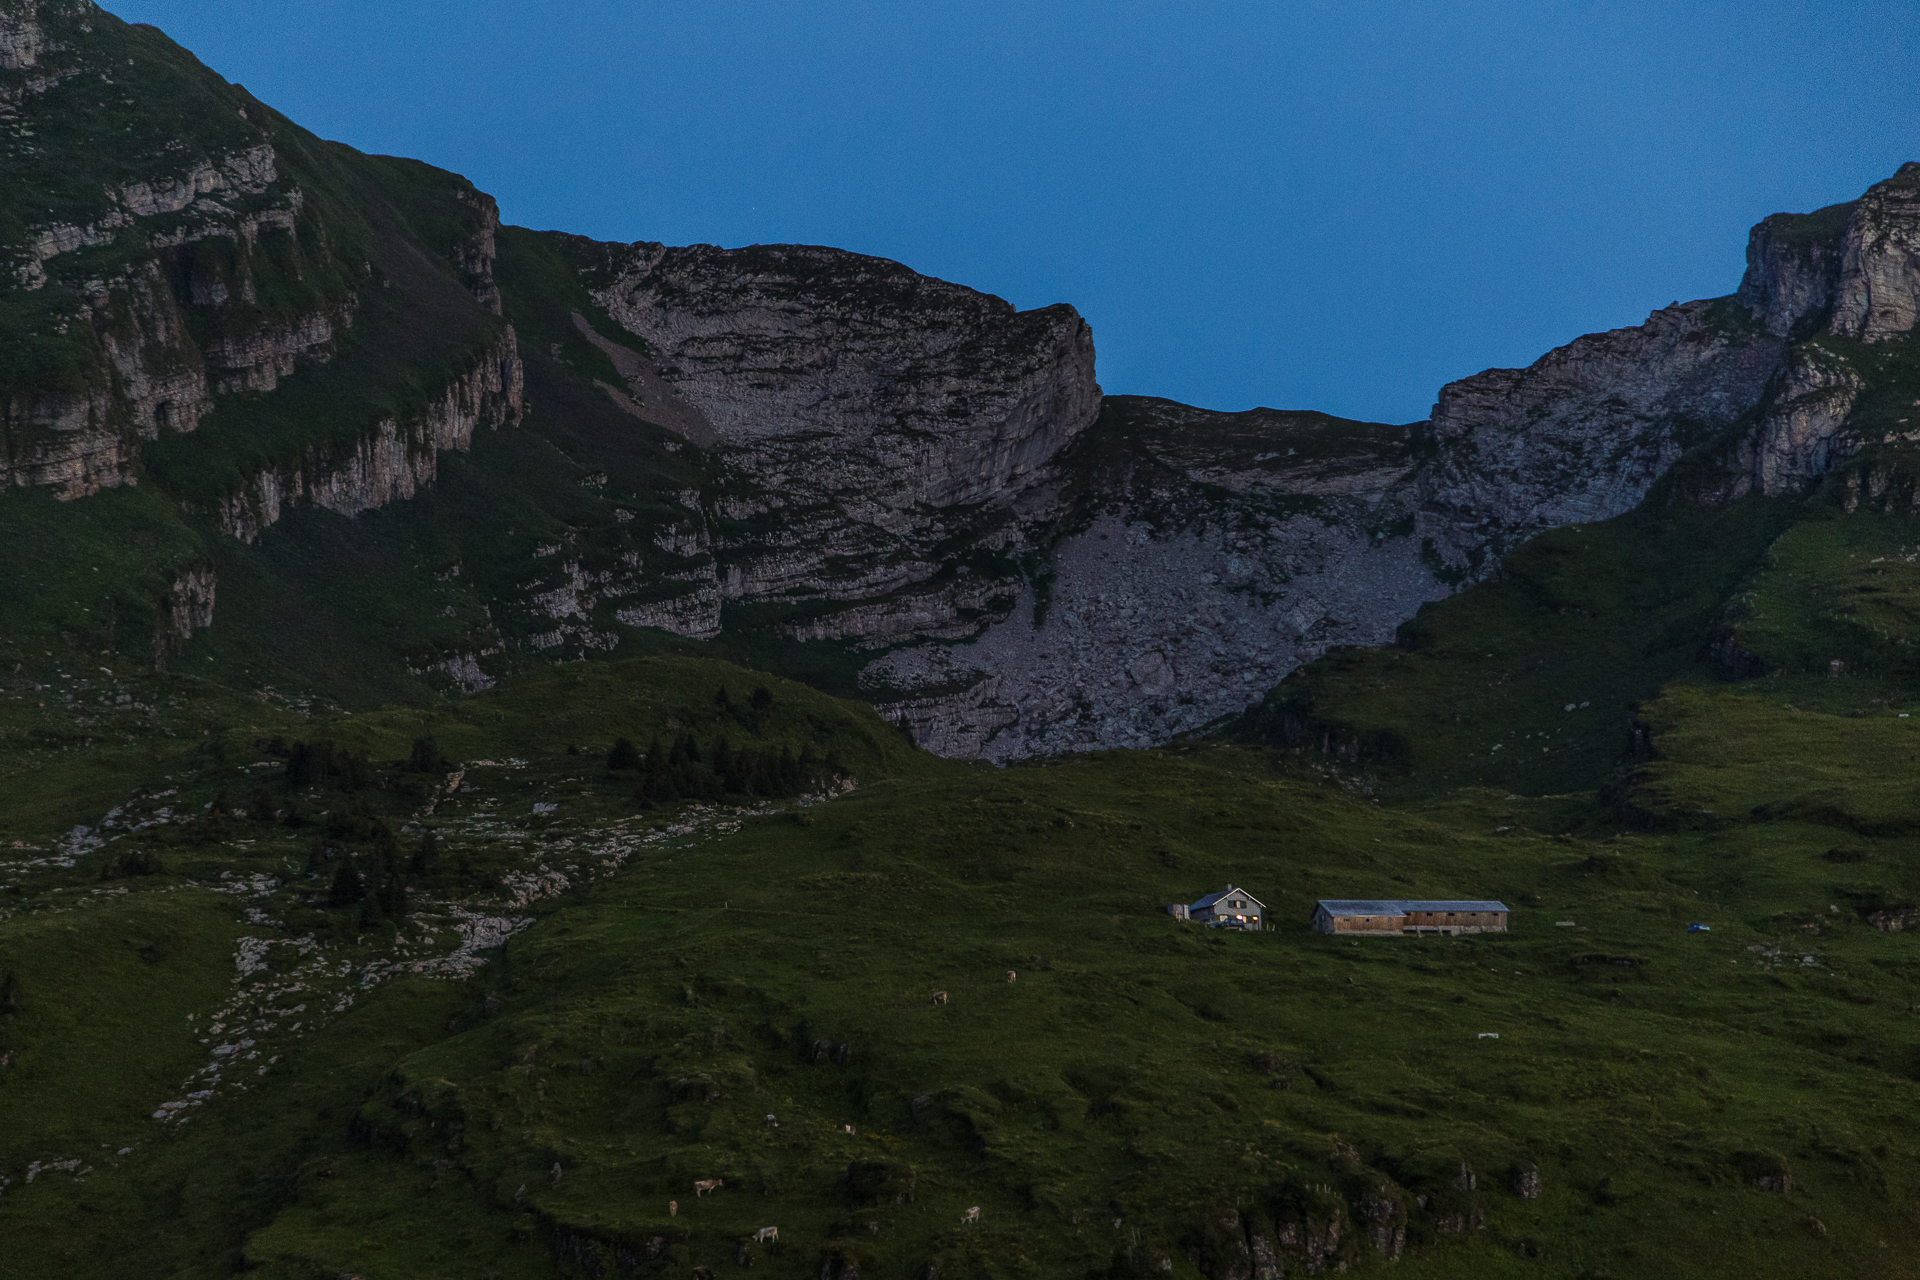 Vordere-Selunalp-Alphuette